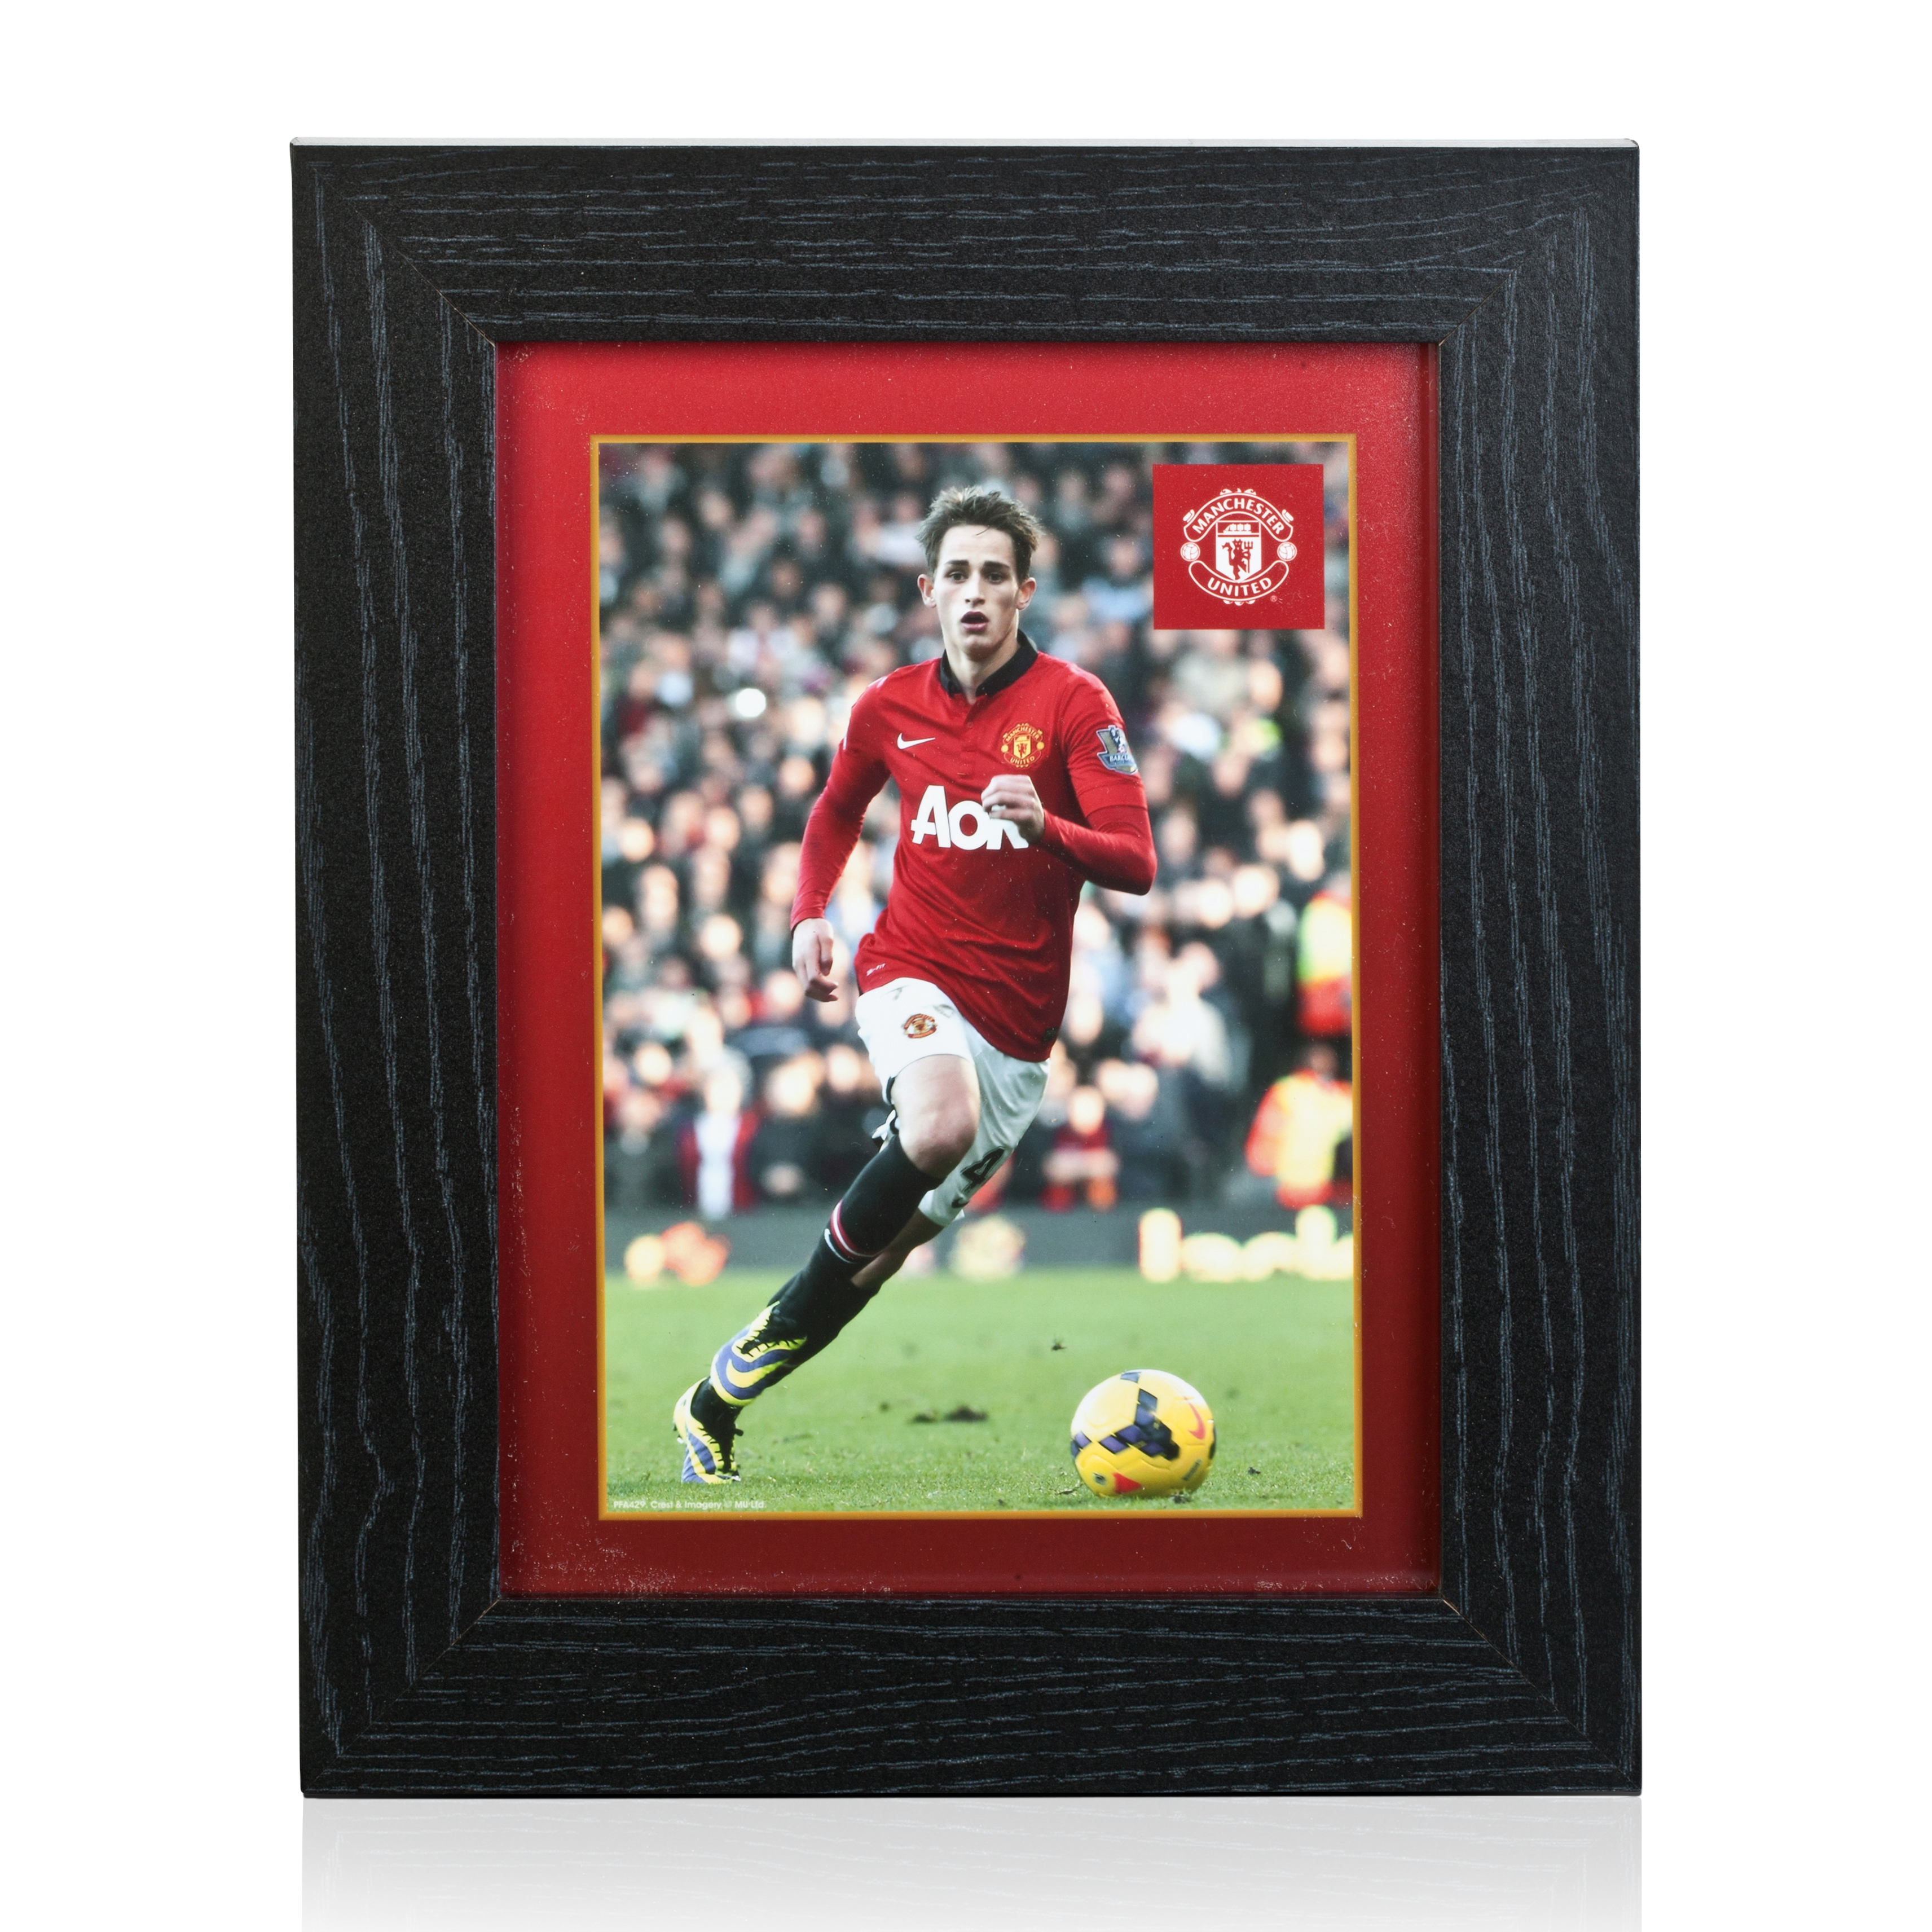 Manchester United 2013/14 Januzaj Framed Print - 8 x 6 Inch